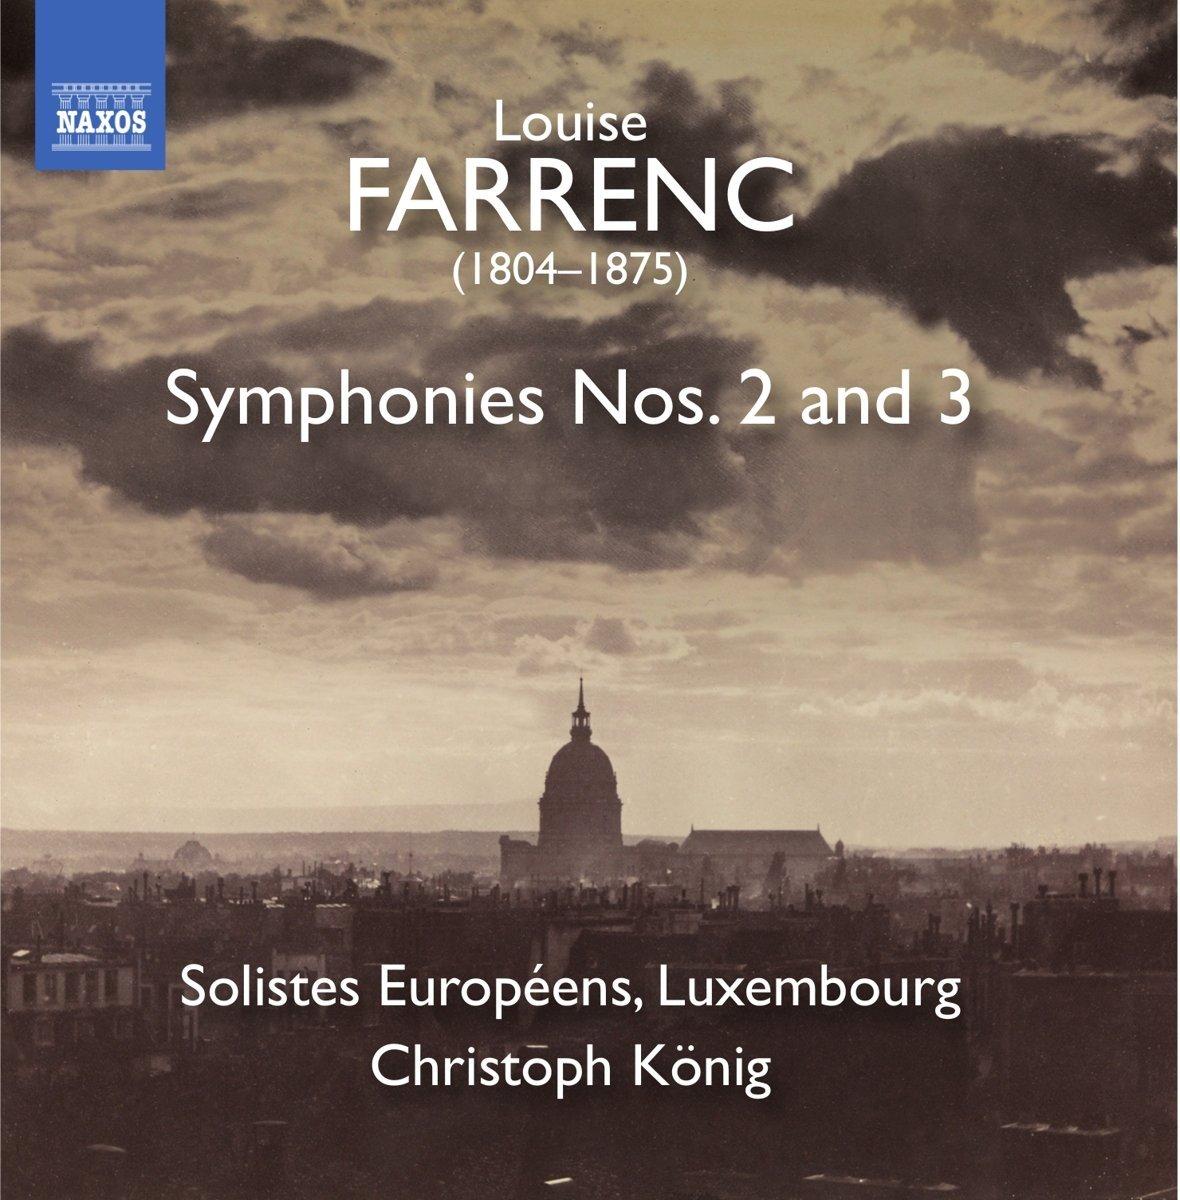 farrenc symphonies naxos